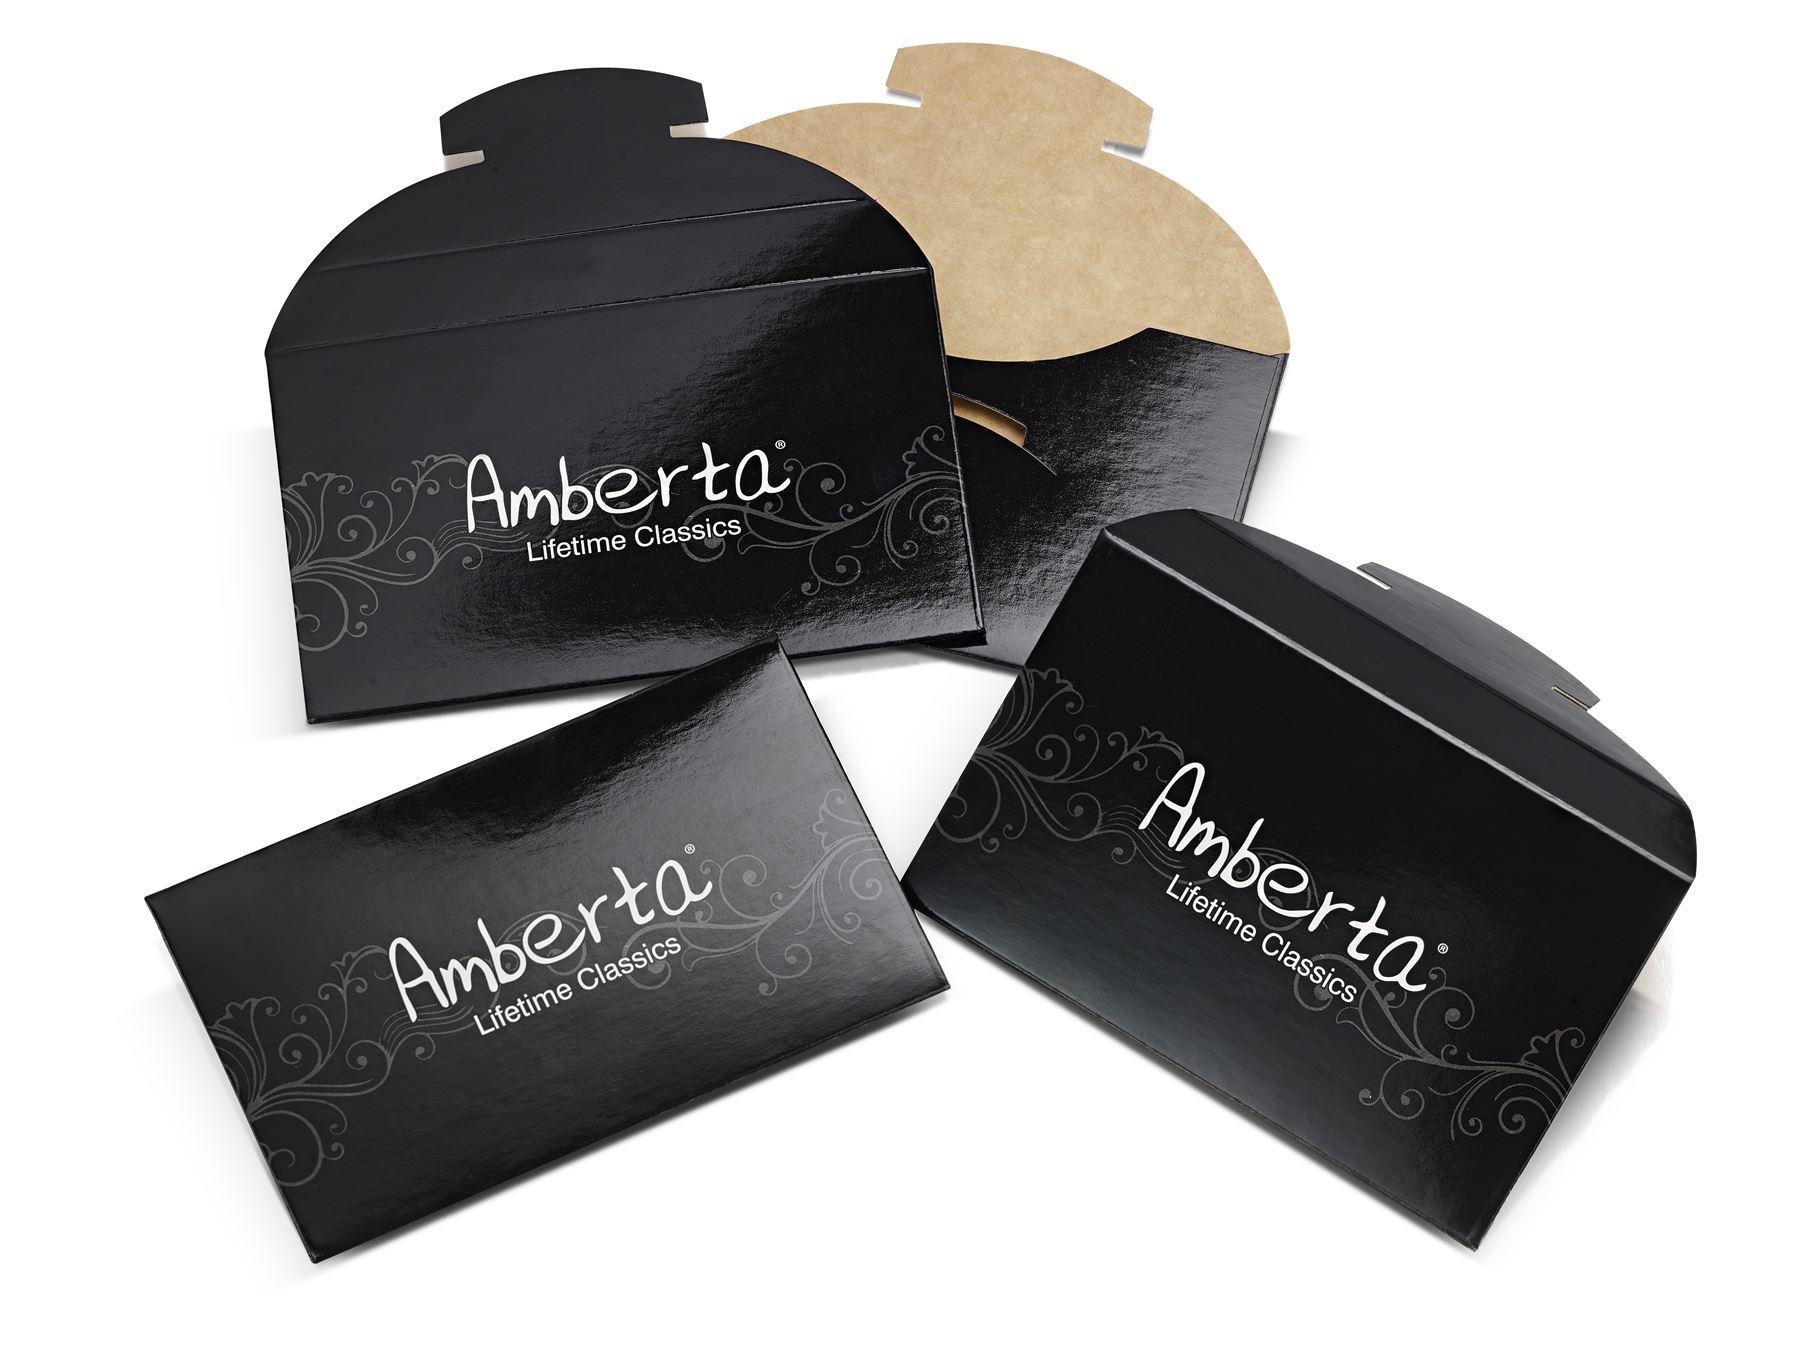 Amberta-Jewelry-925-Sterling-Silver-Adjustable-Bracelet-Italian-Bangle-for-Women thumbnail 55